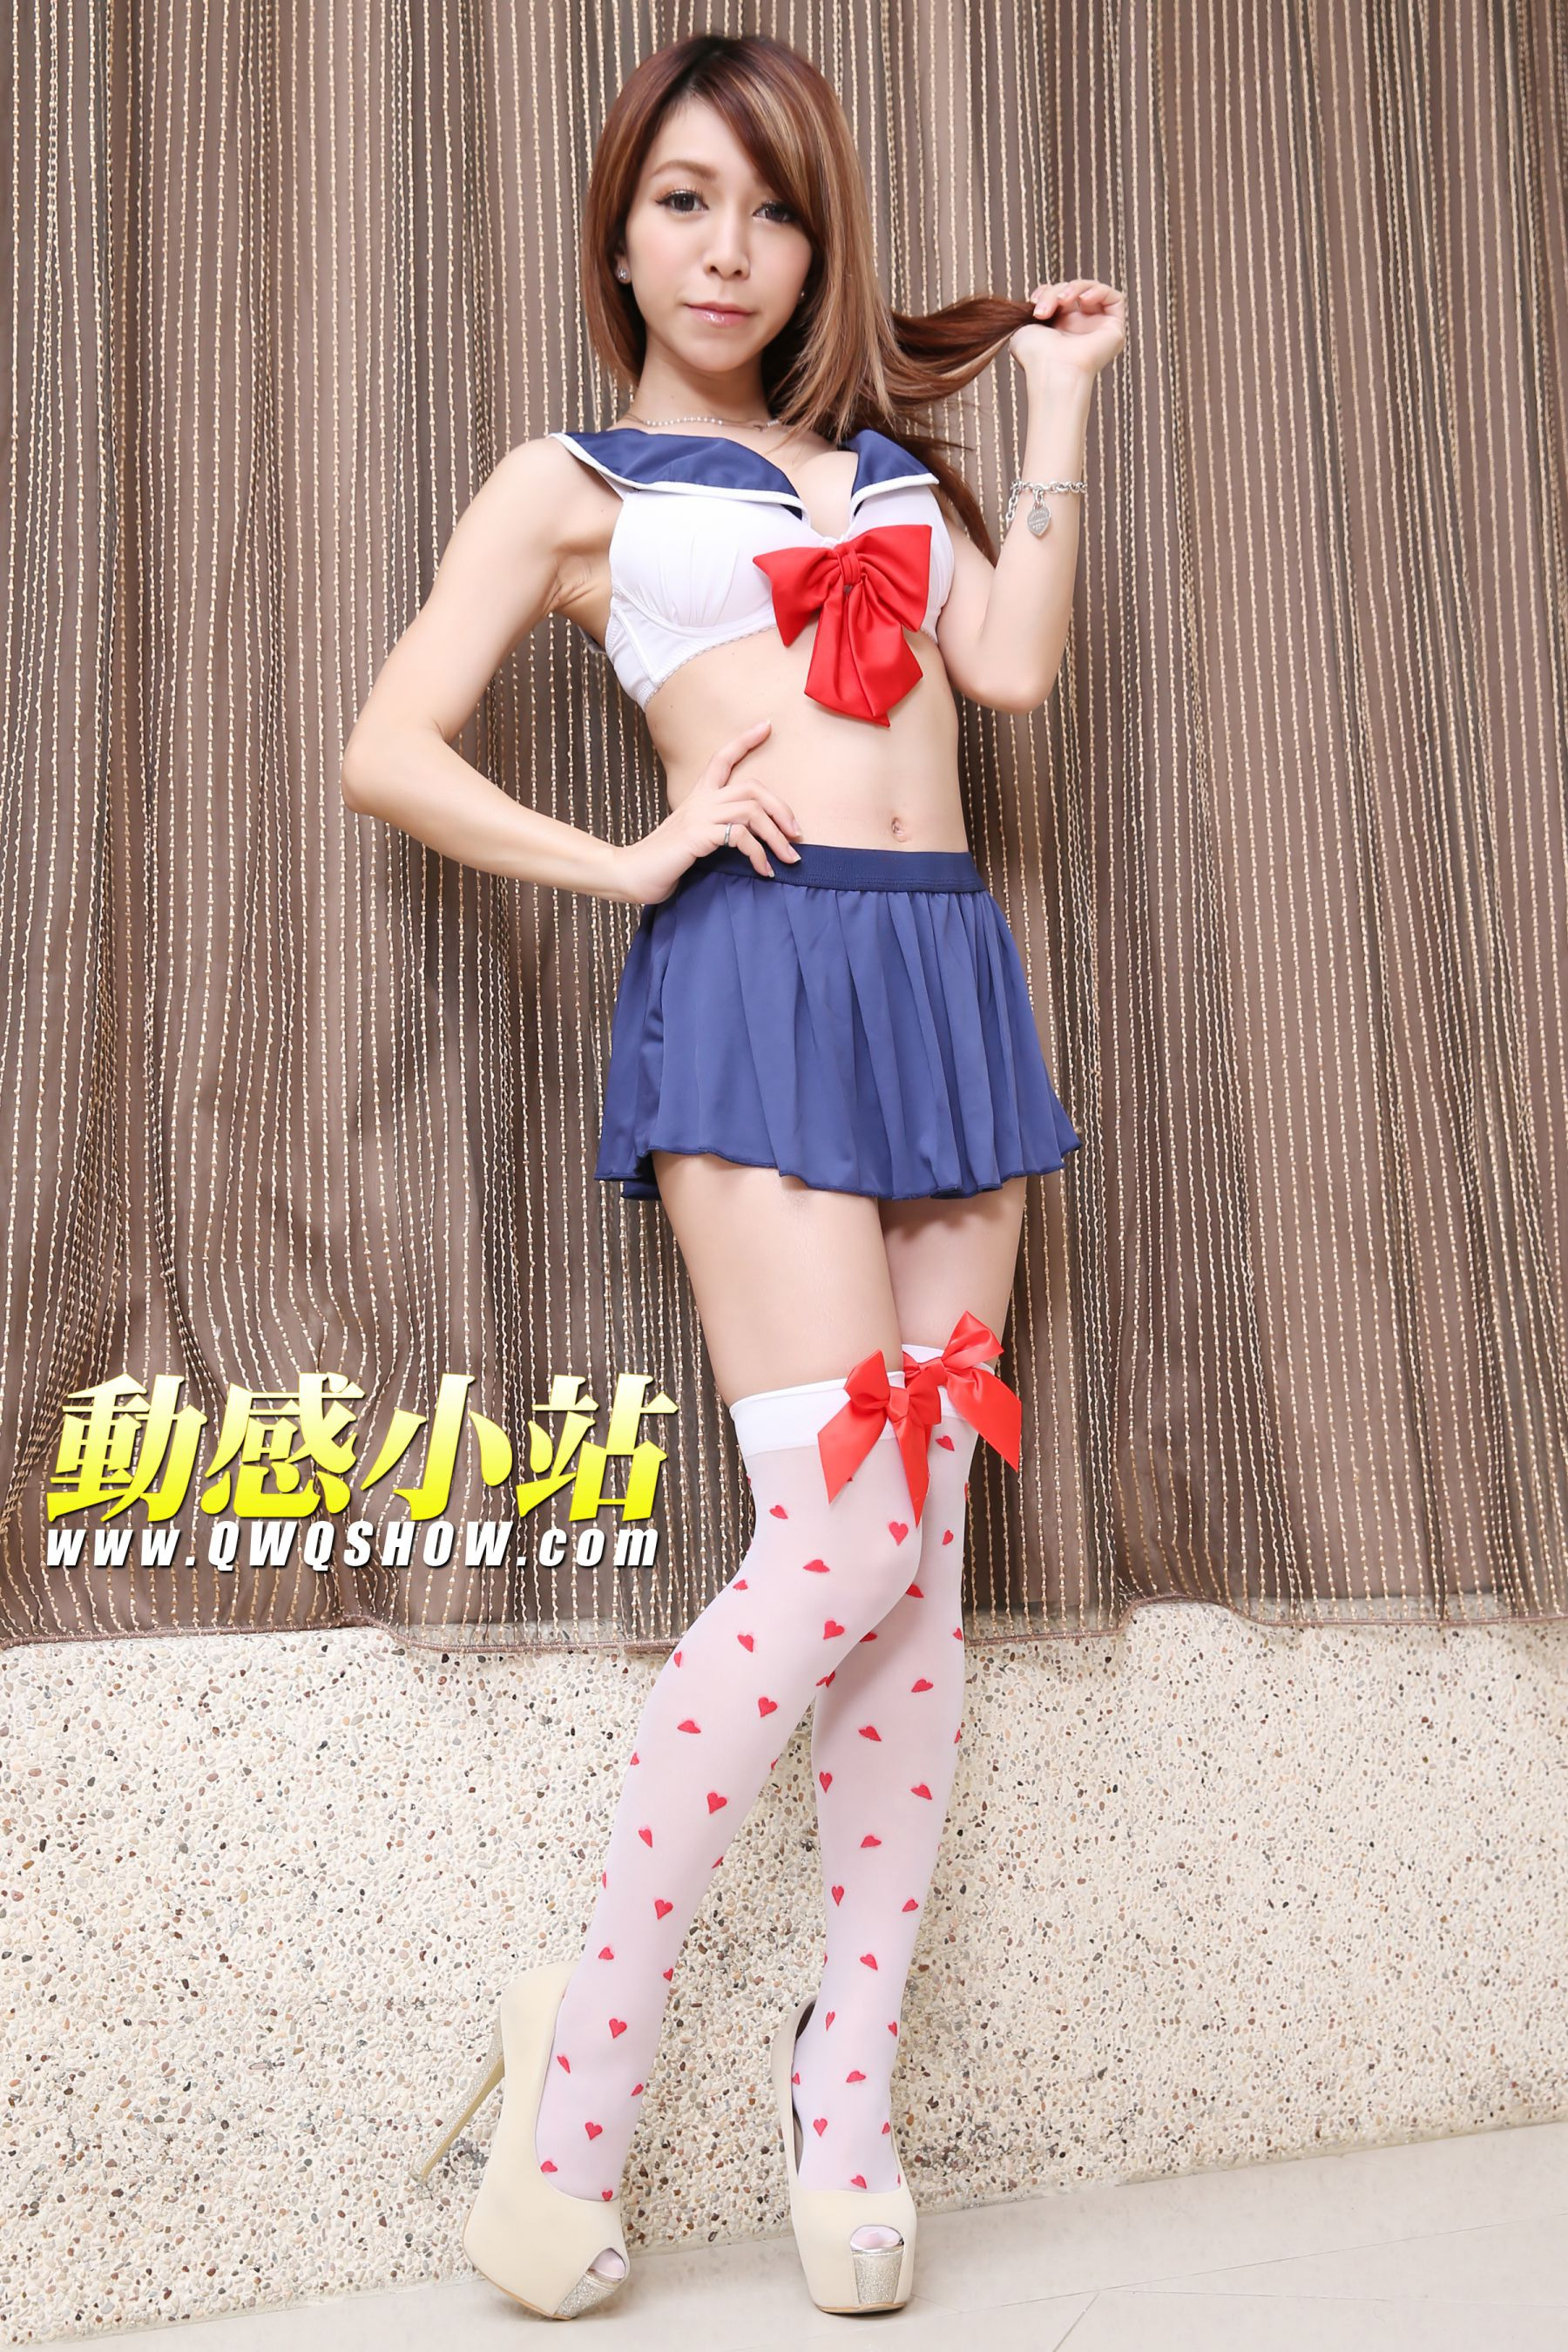 VOL.550 [动感之星]水手服美少女白丝:布布(动感小站布布,动感之星布布)超高清个人性感漂亮大图(85P)